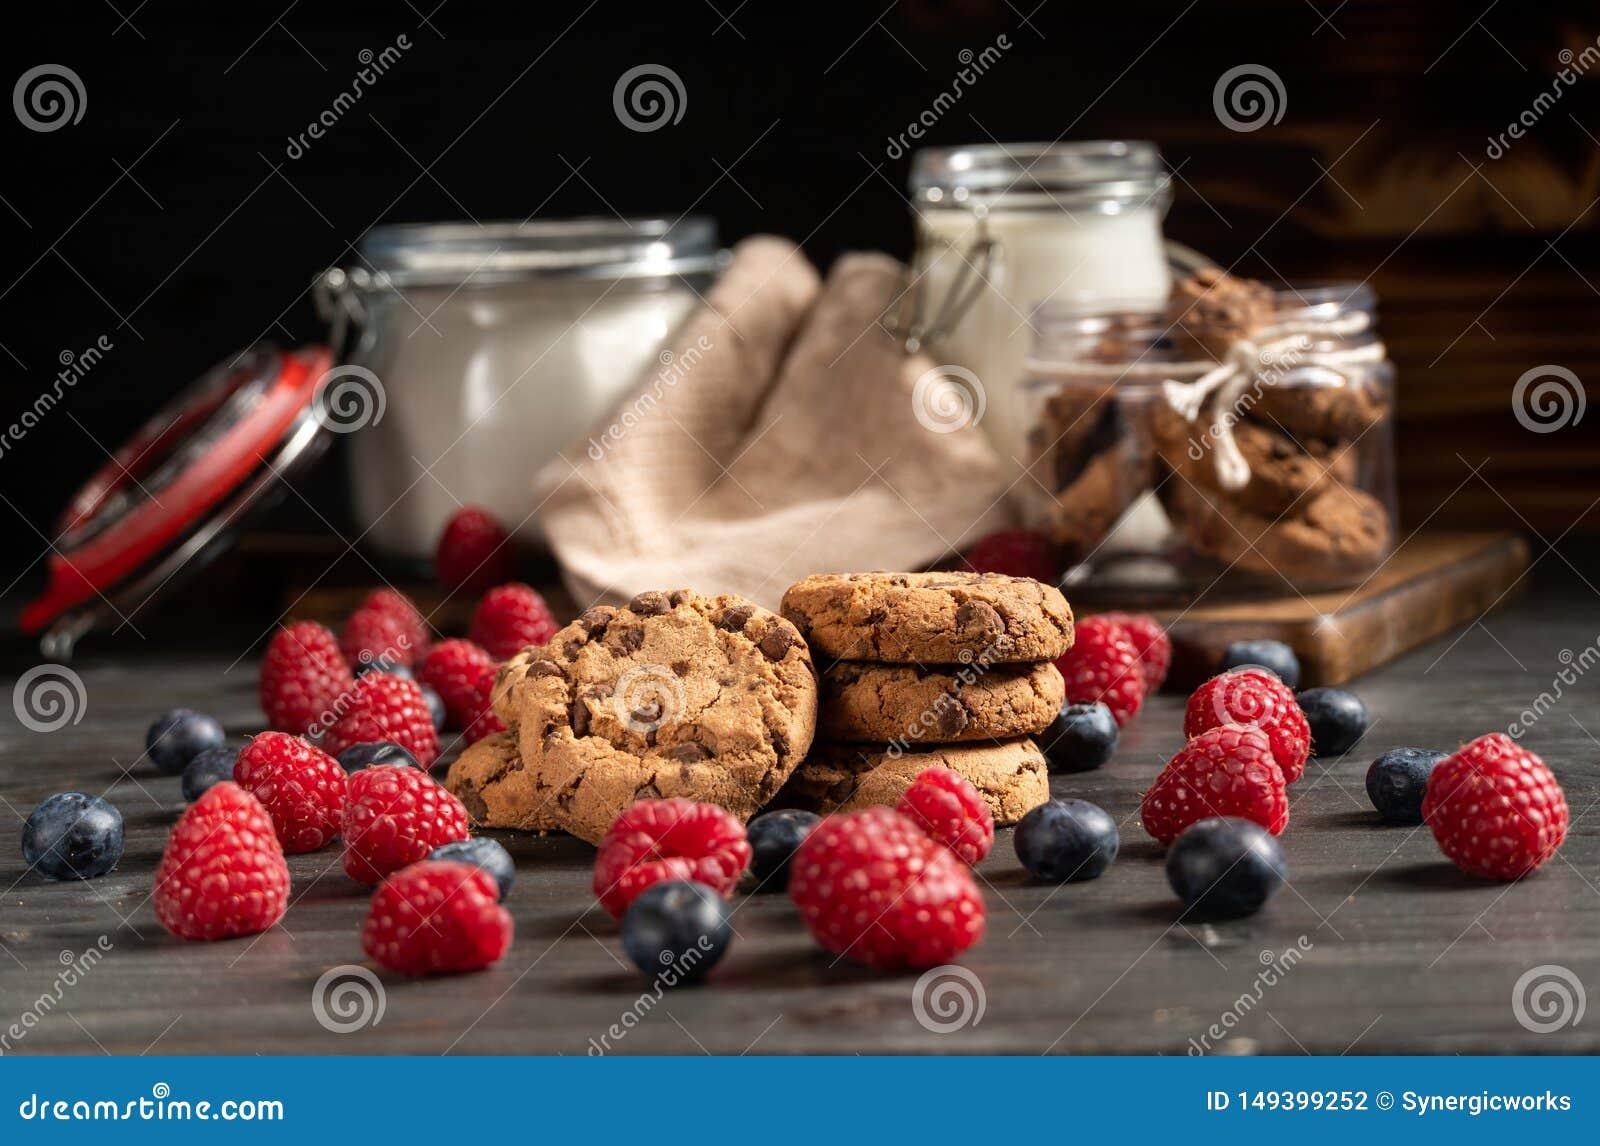 As framboesas, os mirtilos e as cookies no foco, no leite e na farinha selaram frascos no fundo